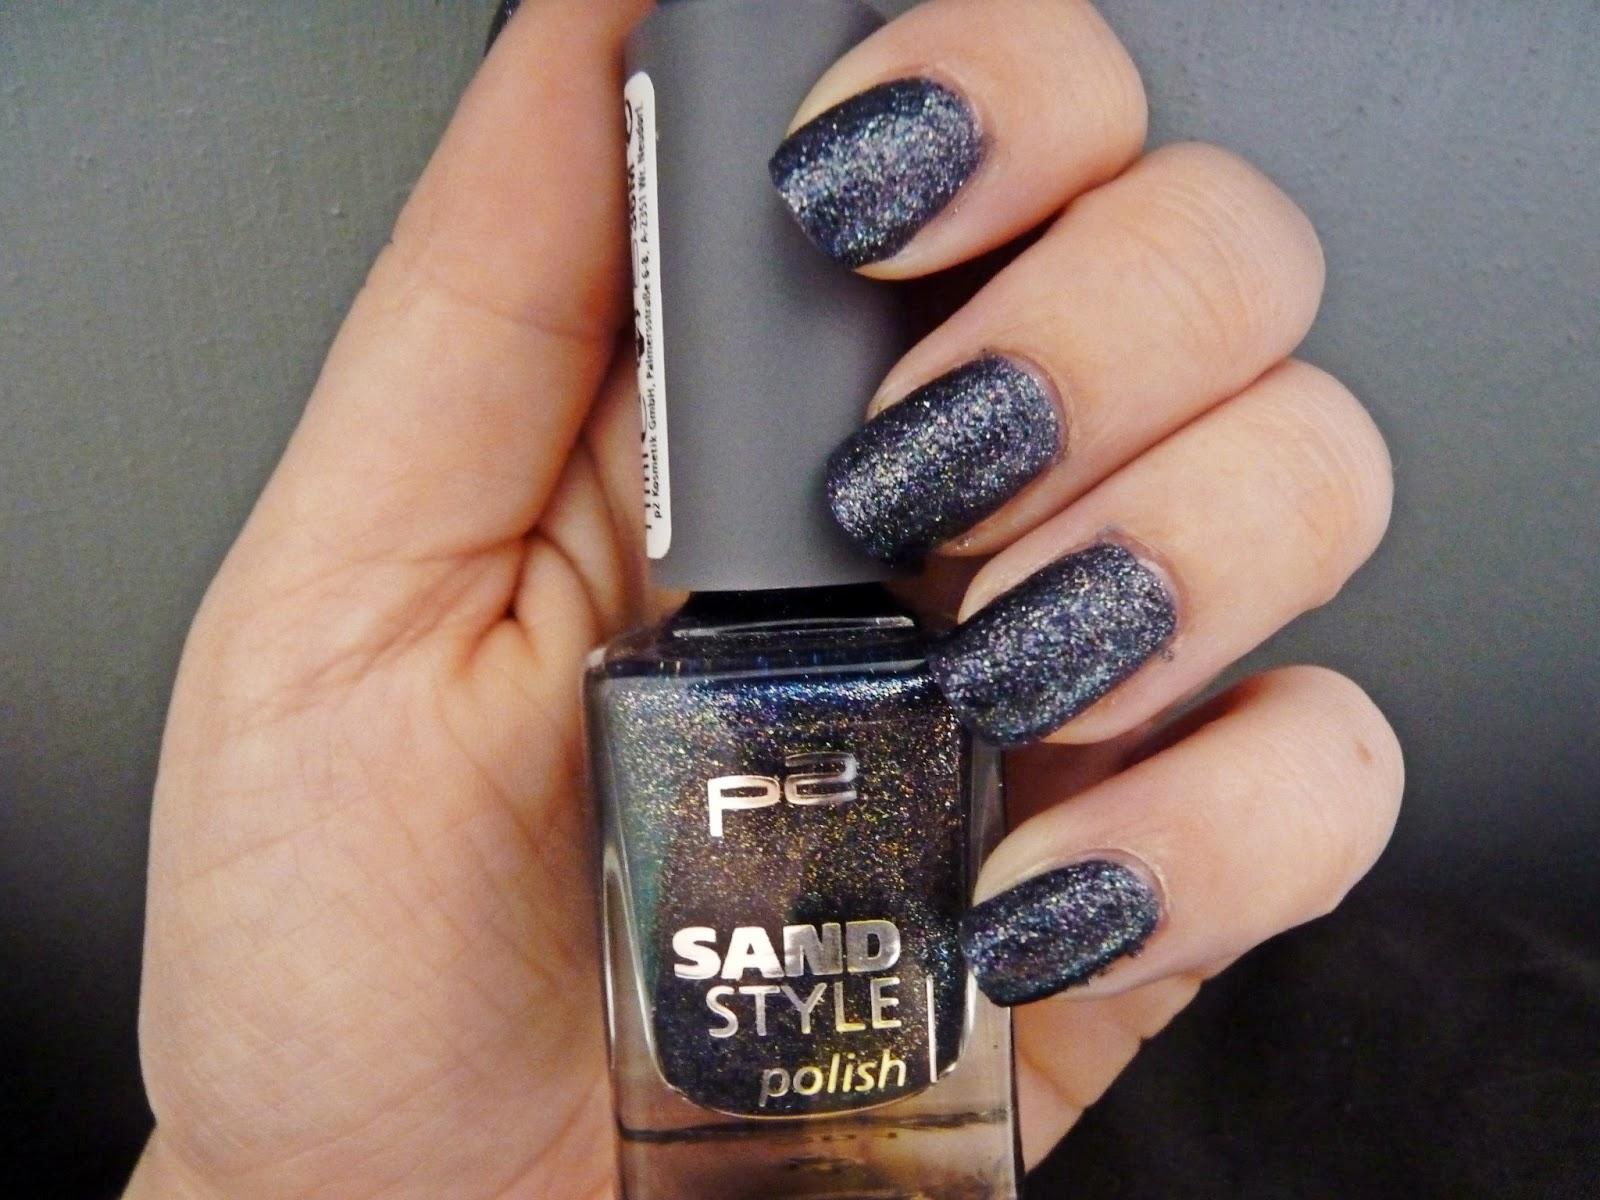 beauty polish tralala nails sand style glitzernagellack entfernen. Black Bedroom Furniture Sets. Home Design Ideas